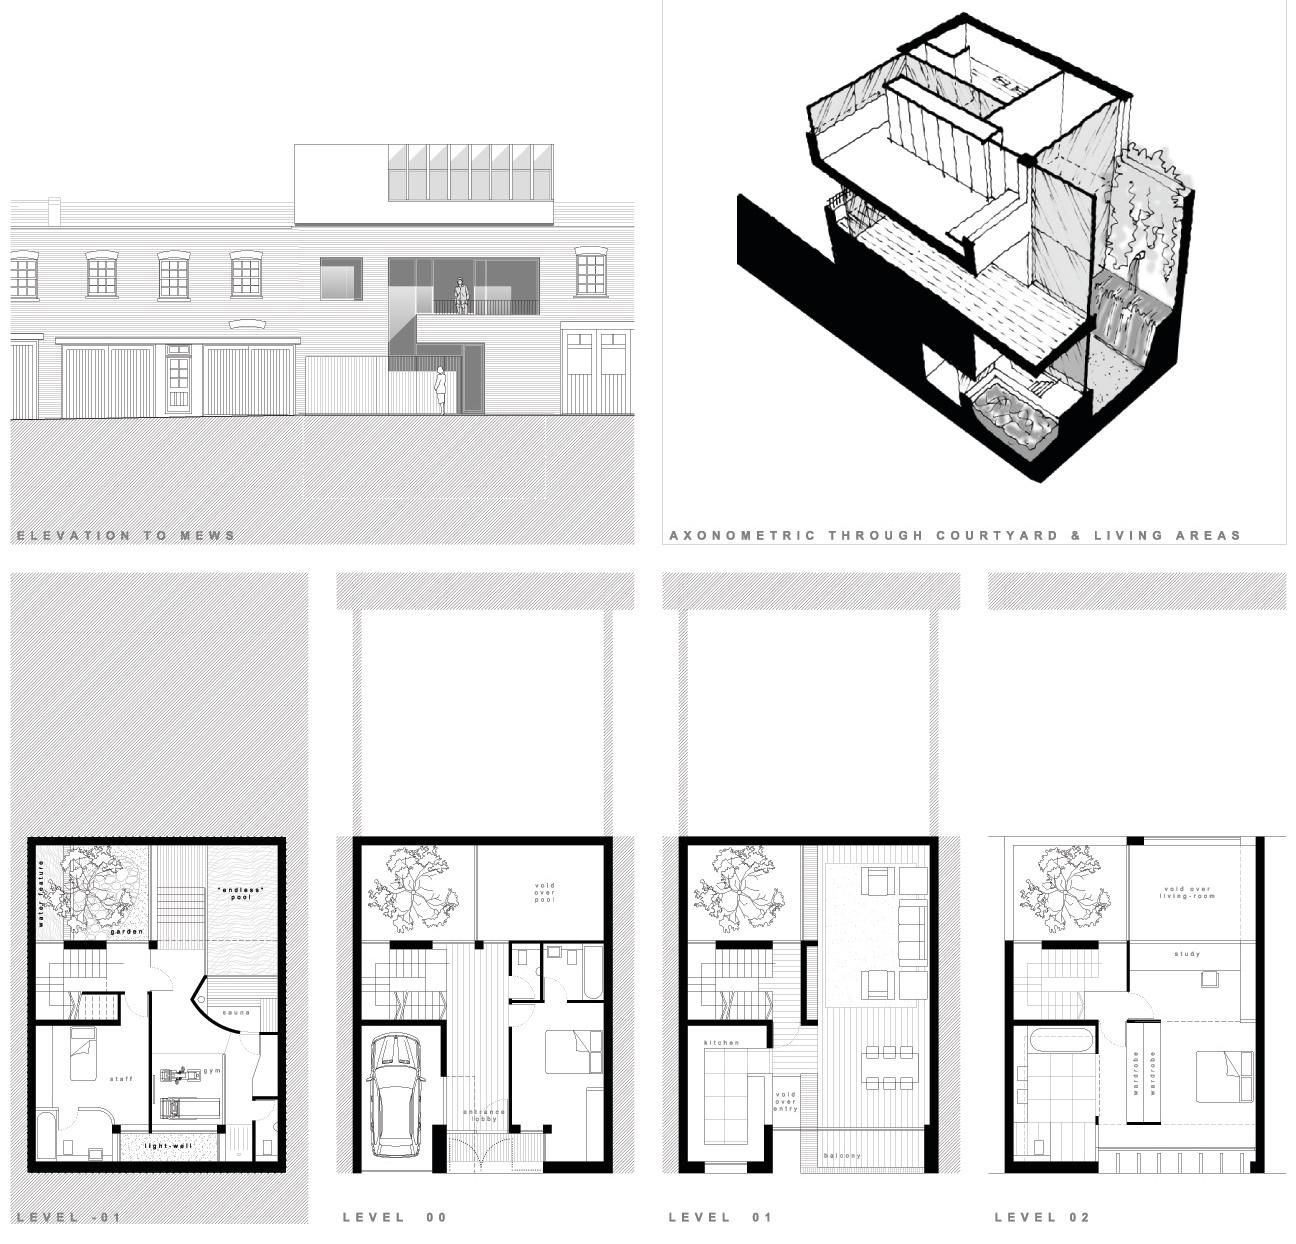 Design proposal for mews property